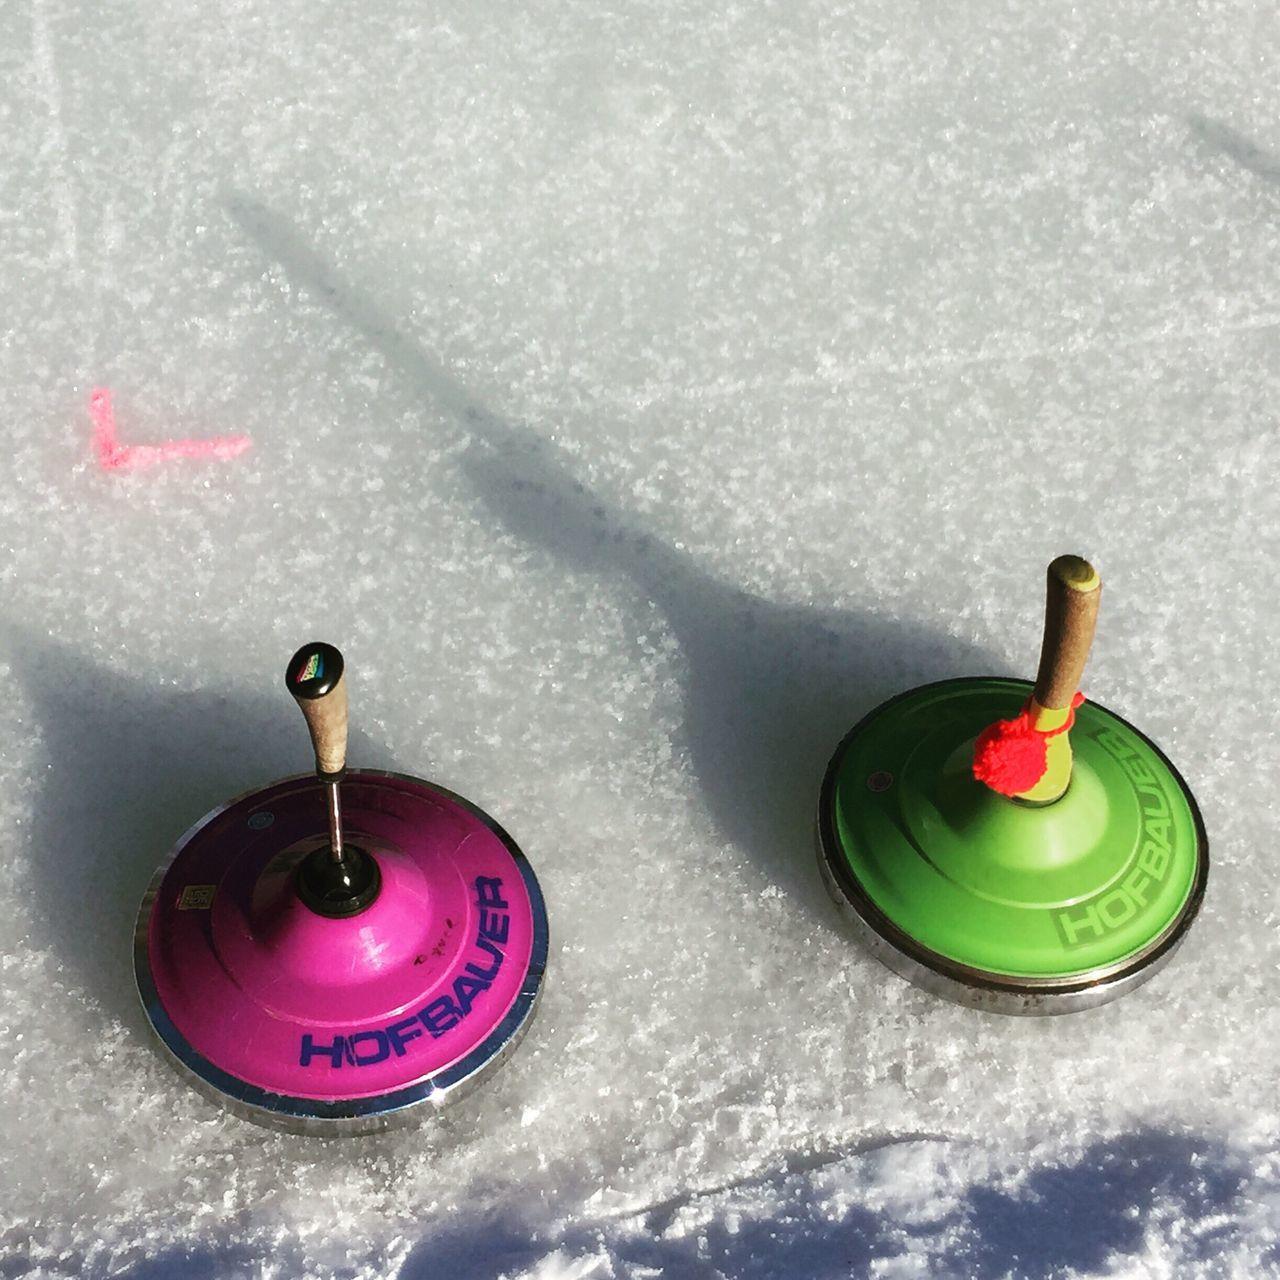 Bavarian Curling Curling Eisstock Winter Sport Allgäuer Alpen Allgäu Frozen Lake Winter Snow Ice